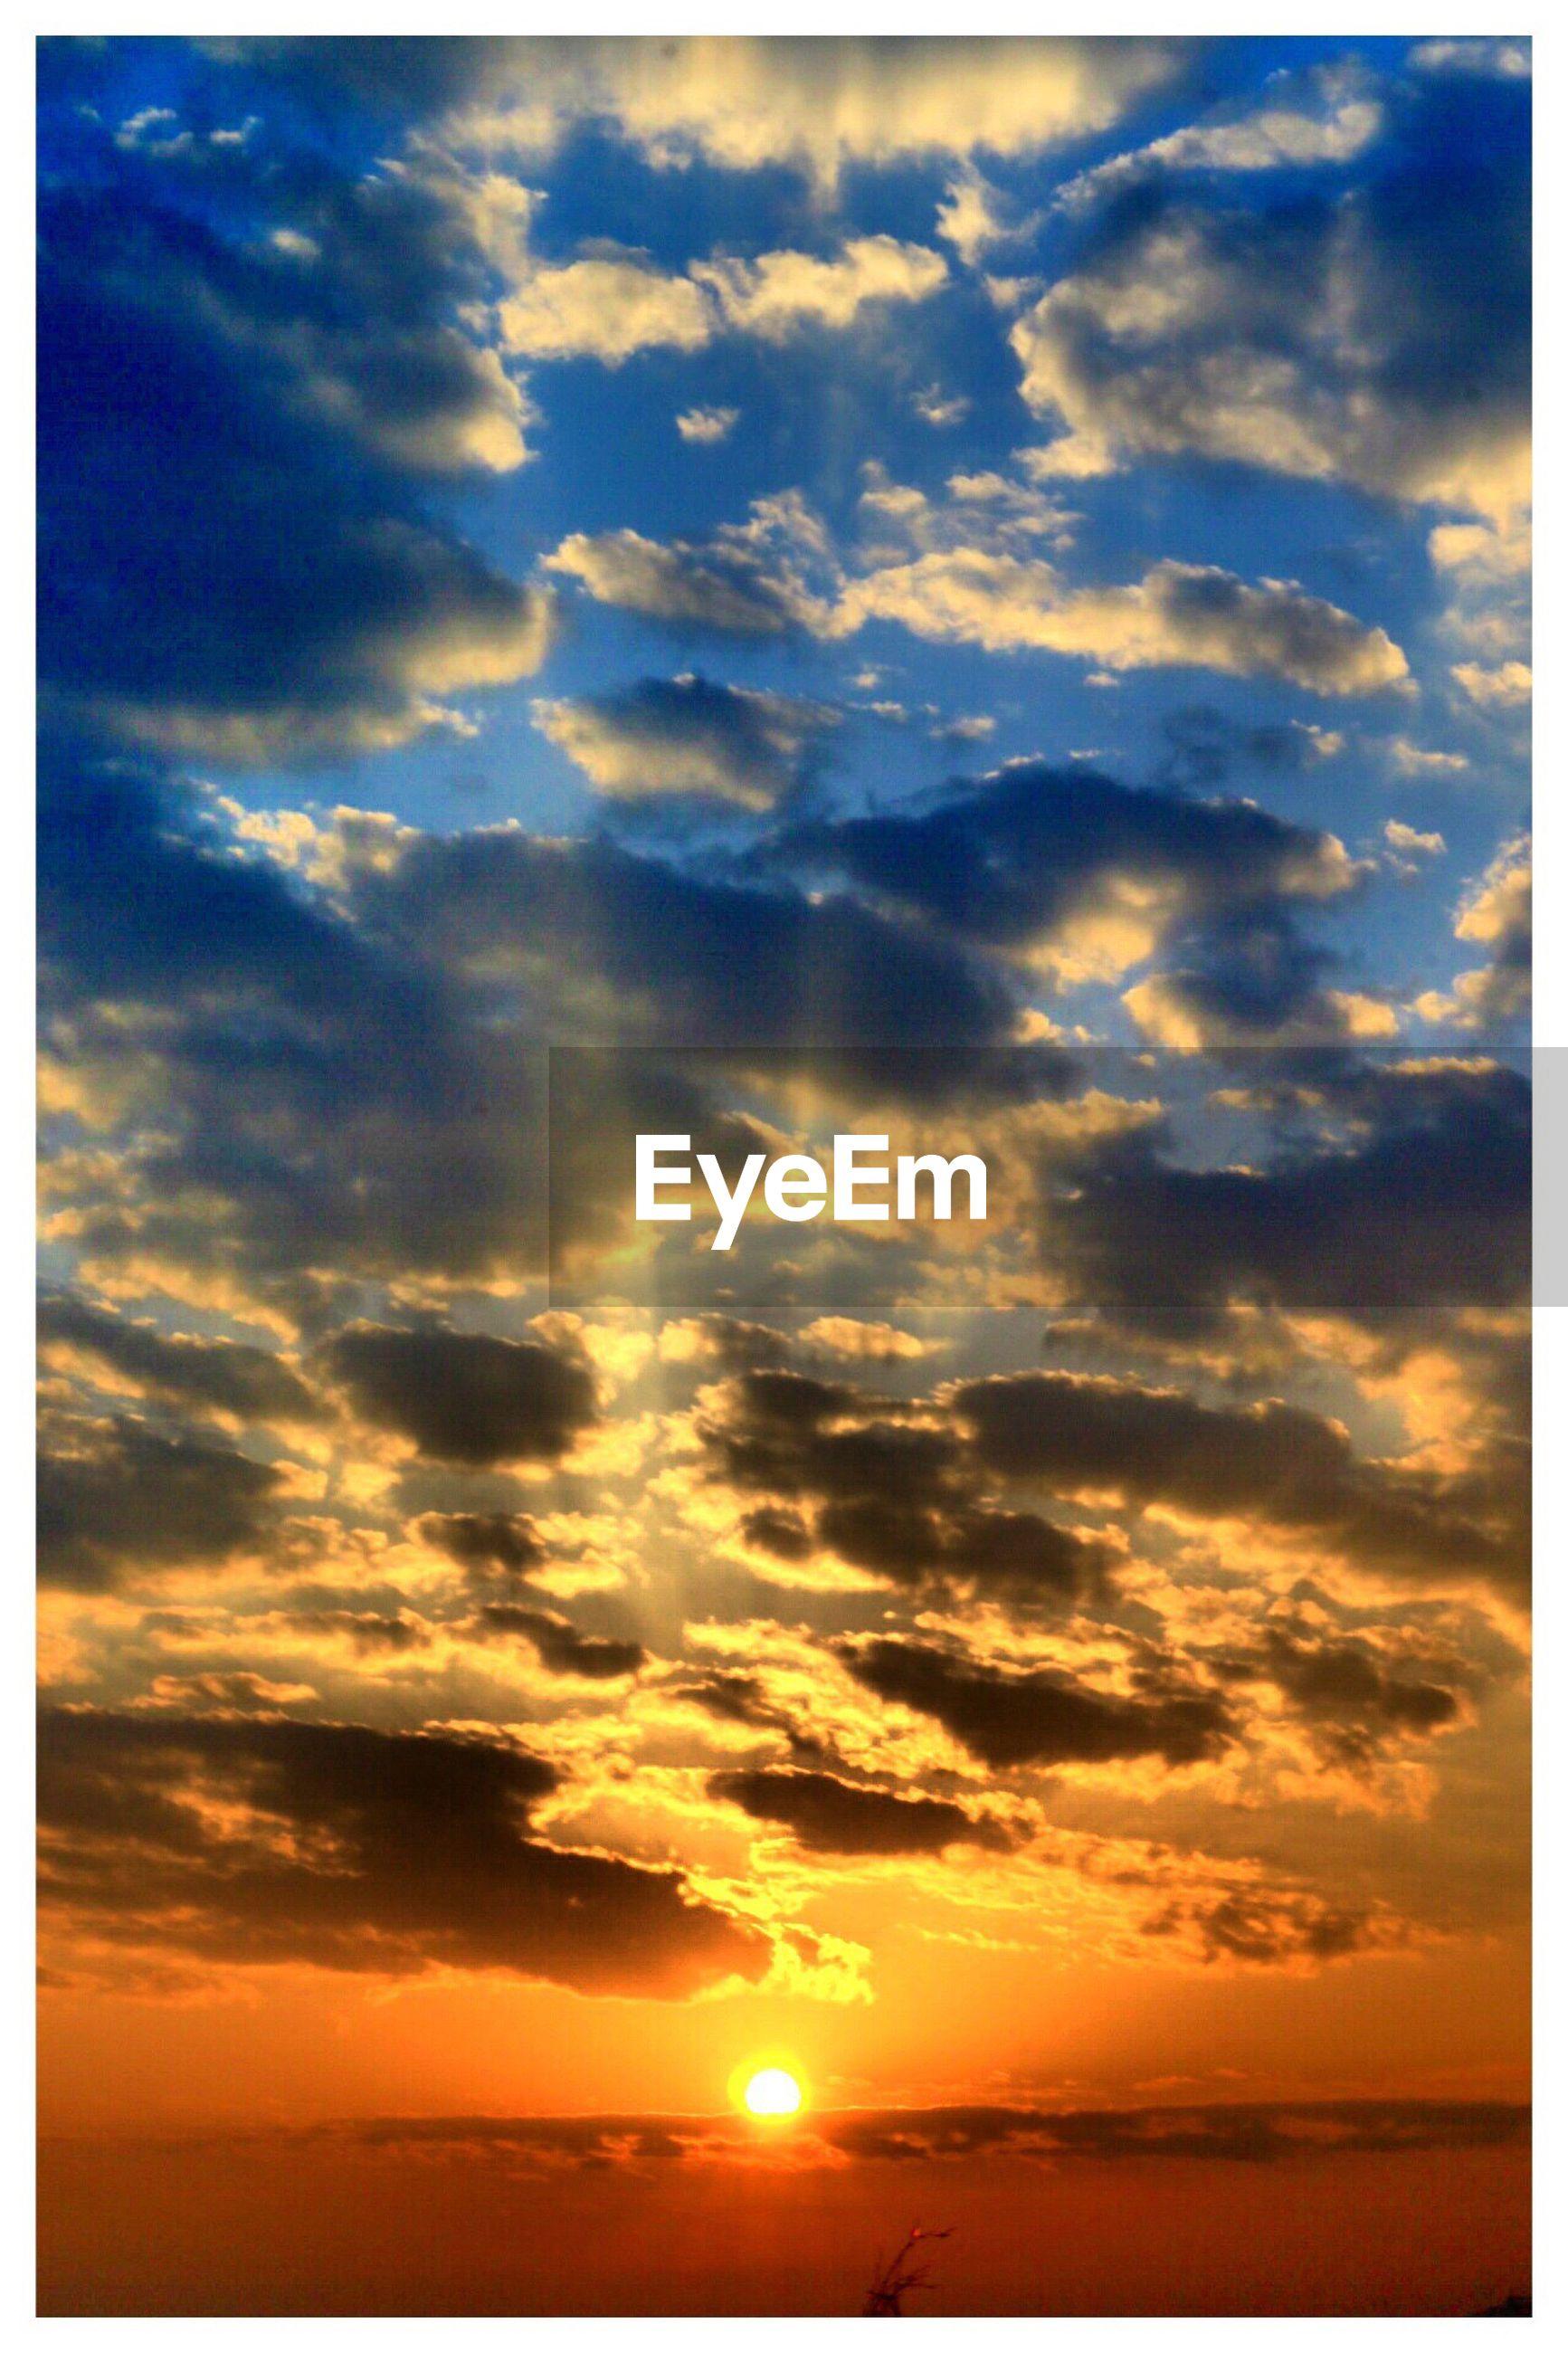 sunset, scenics, sky, tranquil scene, beauty in nature, tranquility, sun, cloud - sky, nature, orange color, idyllic, transfer print, cloud, sea, horizon over water, water, sunlight, cloudy, dramatic sky, majestic